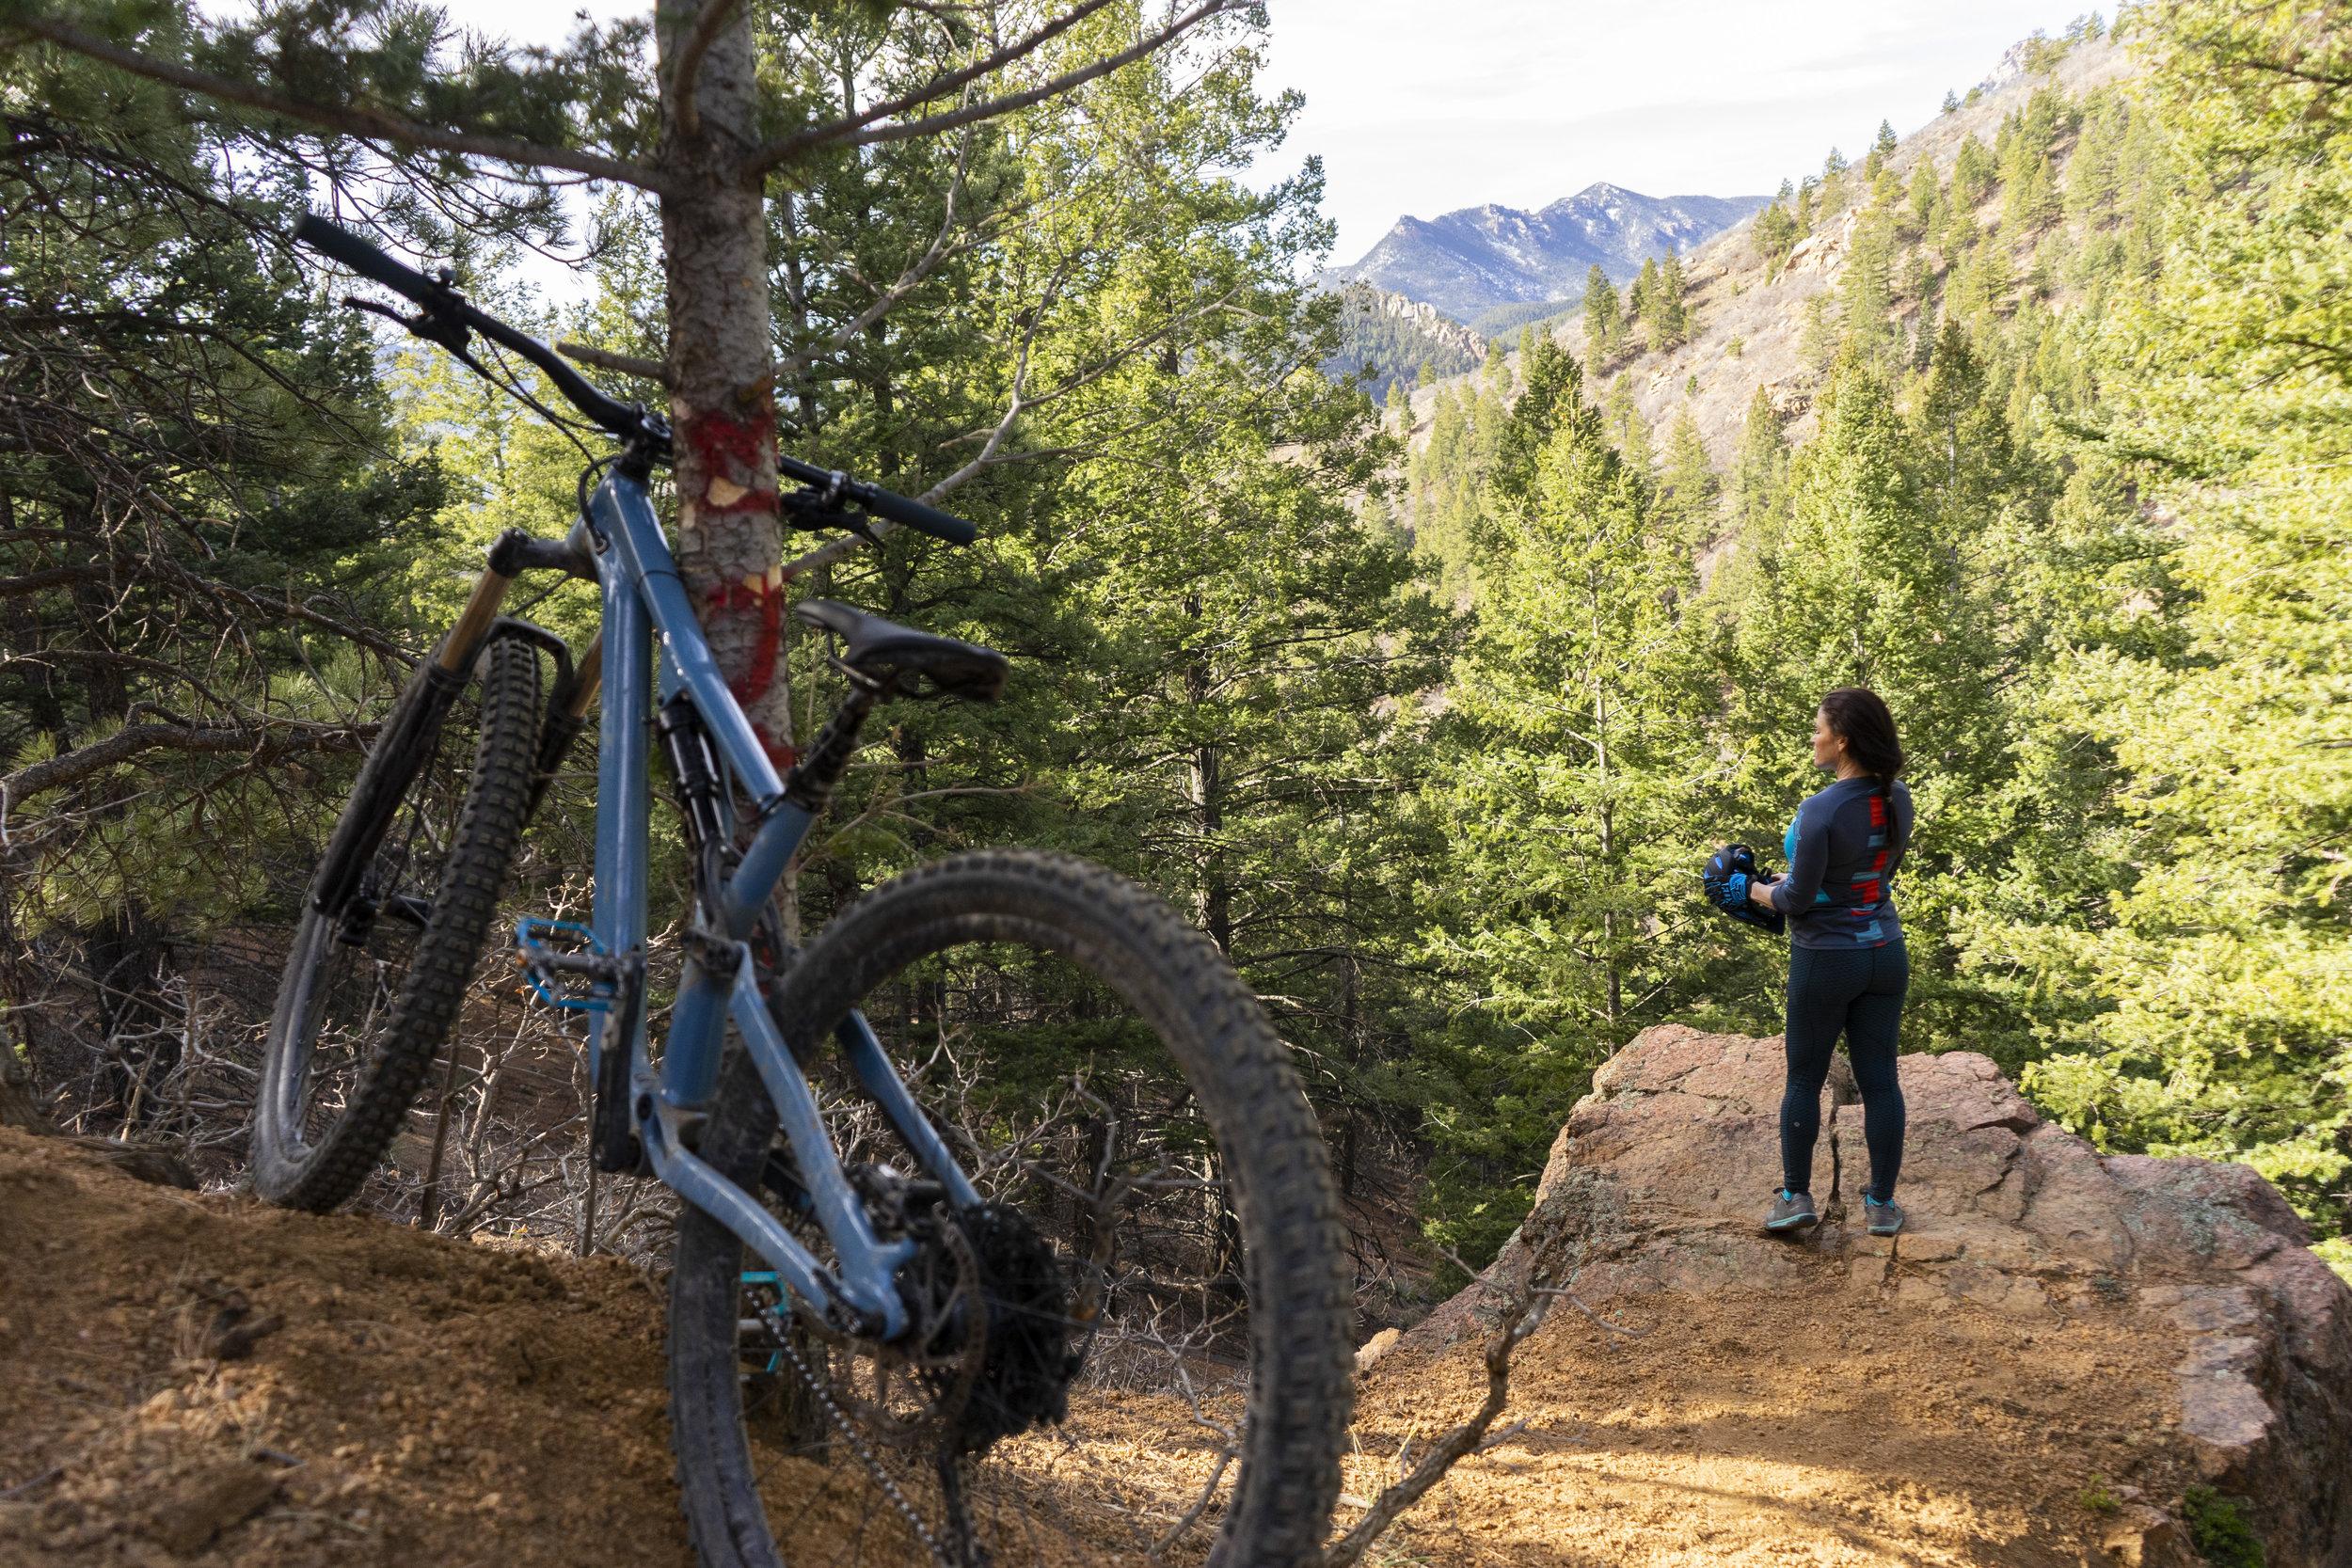 Tracy Mountain Biking on Cheyenne Mountain, Colorado Springs, Colorado 2019